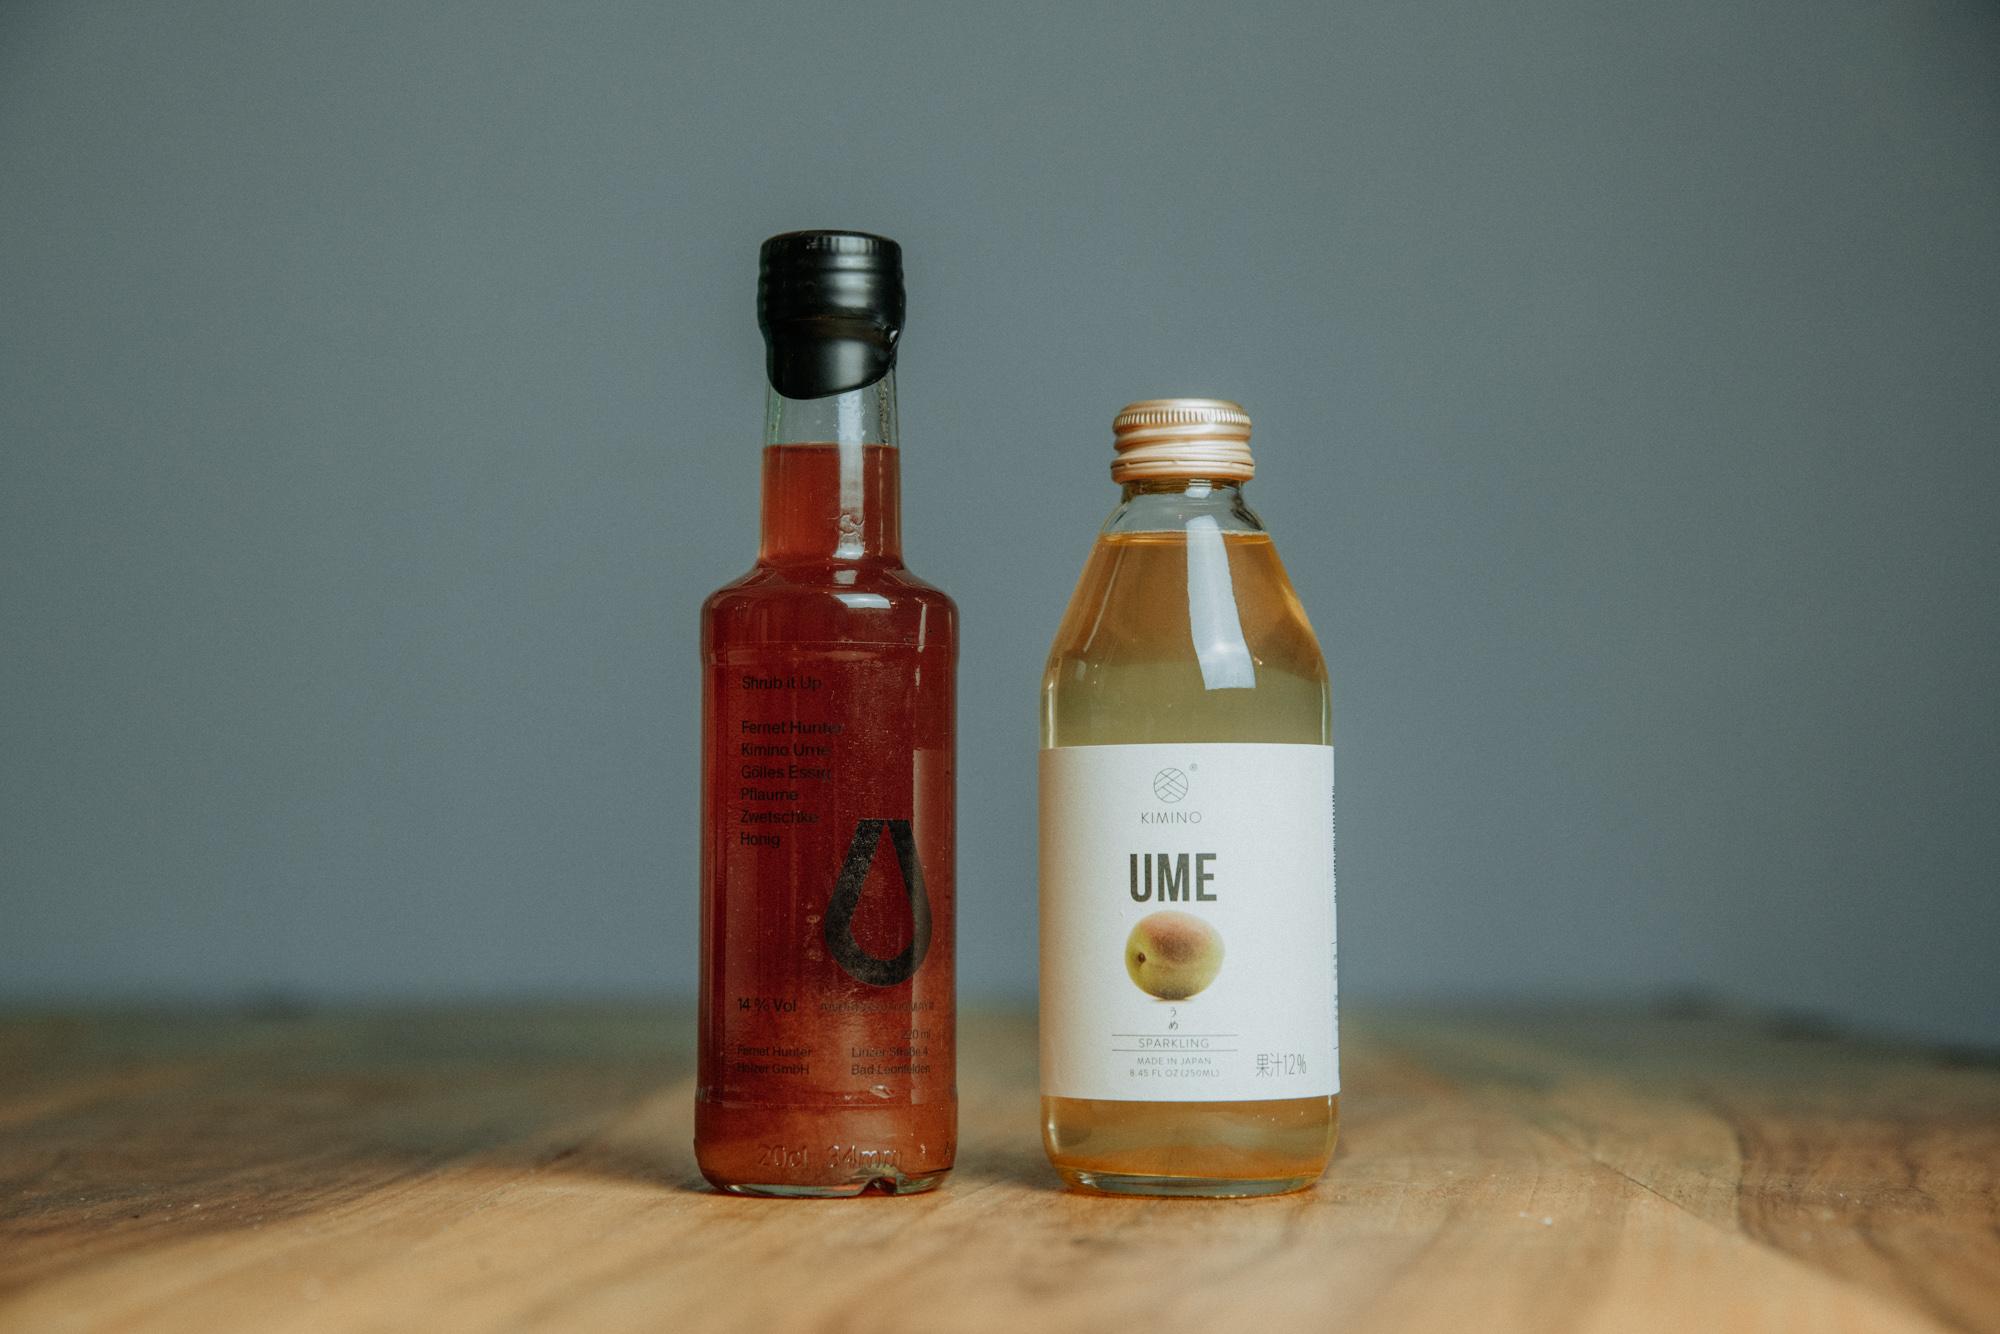 Andreas Lugmayr Bottled Cocktails Shrub it up Kimino Ume Abhohlen Lieferung Linz Österreich